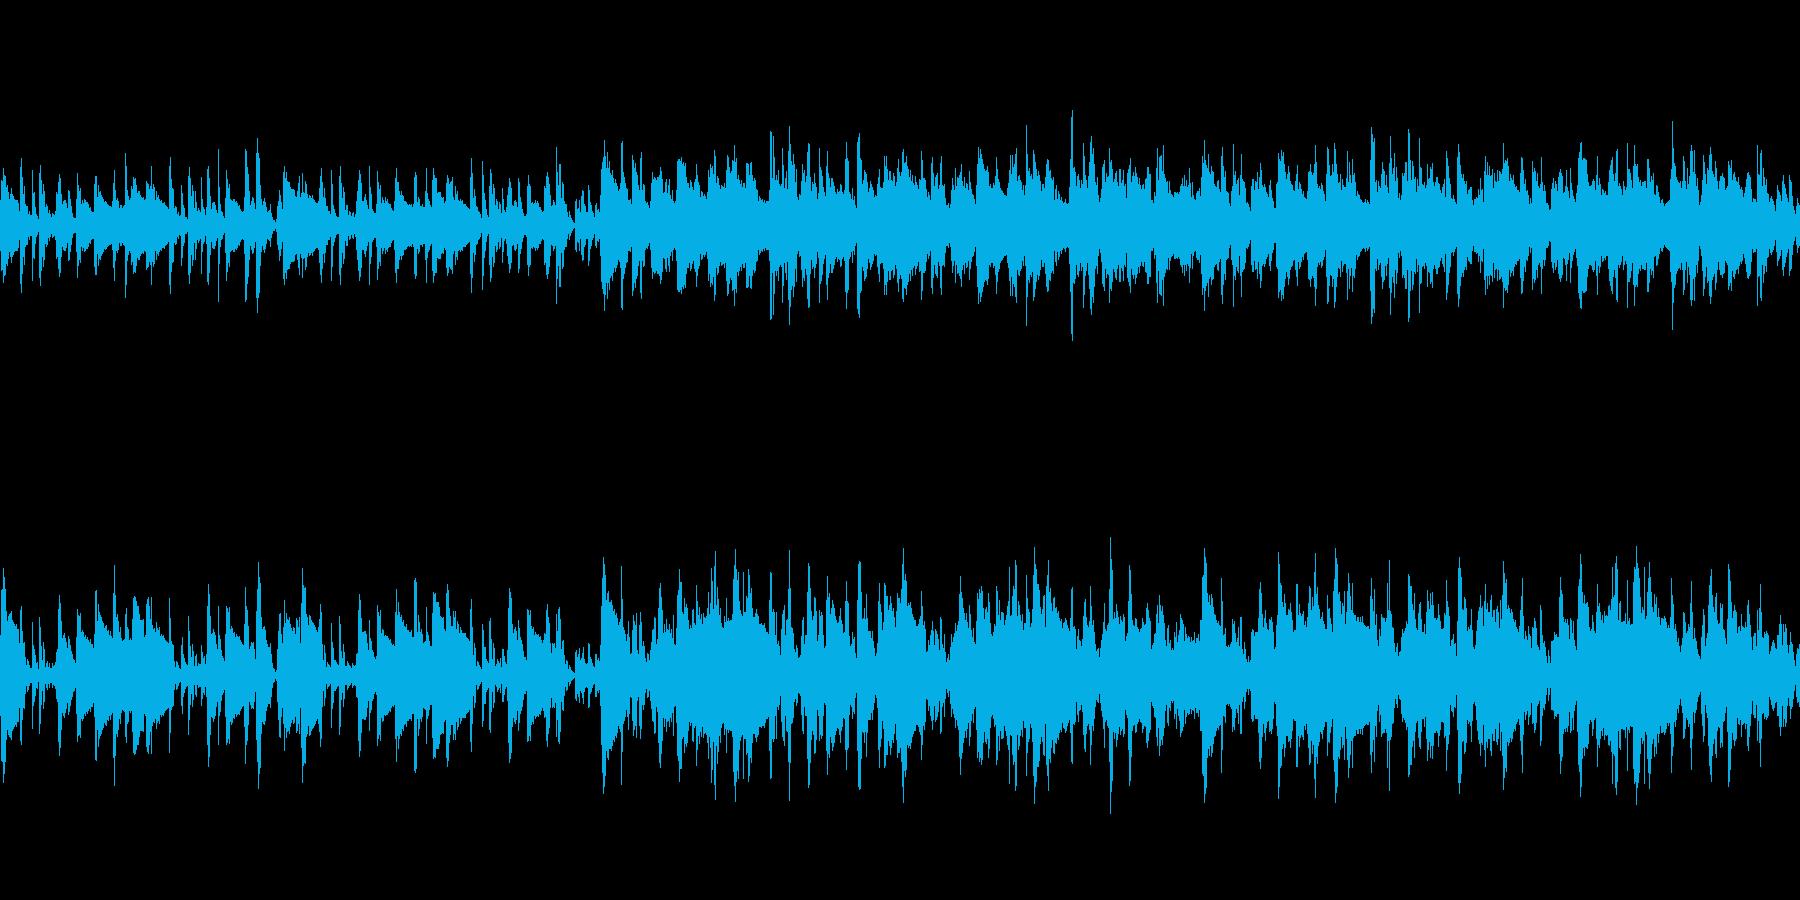 【Loop】アダルトチックなジャズの再生済みの波形